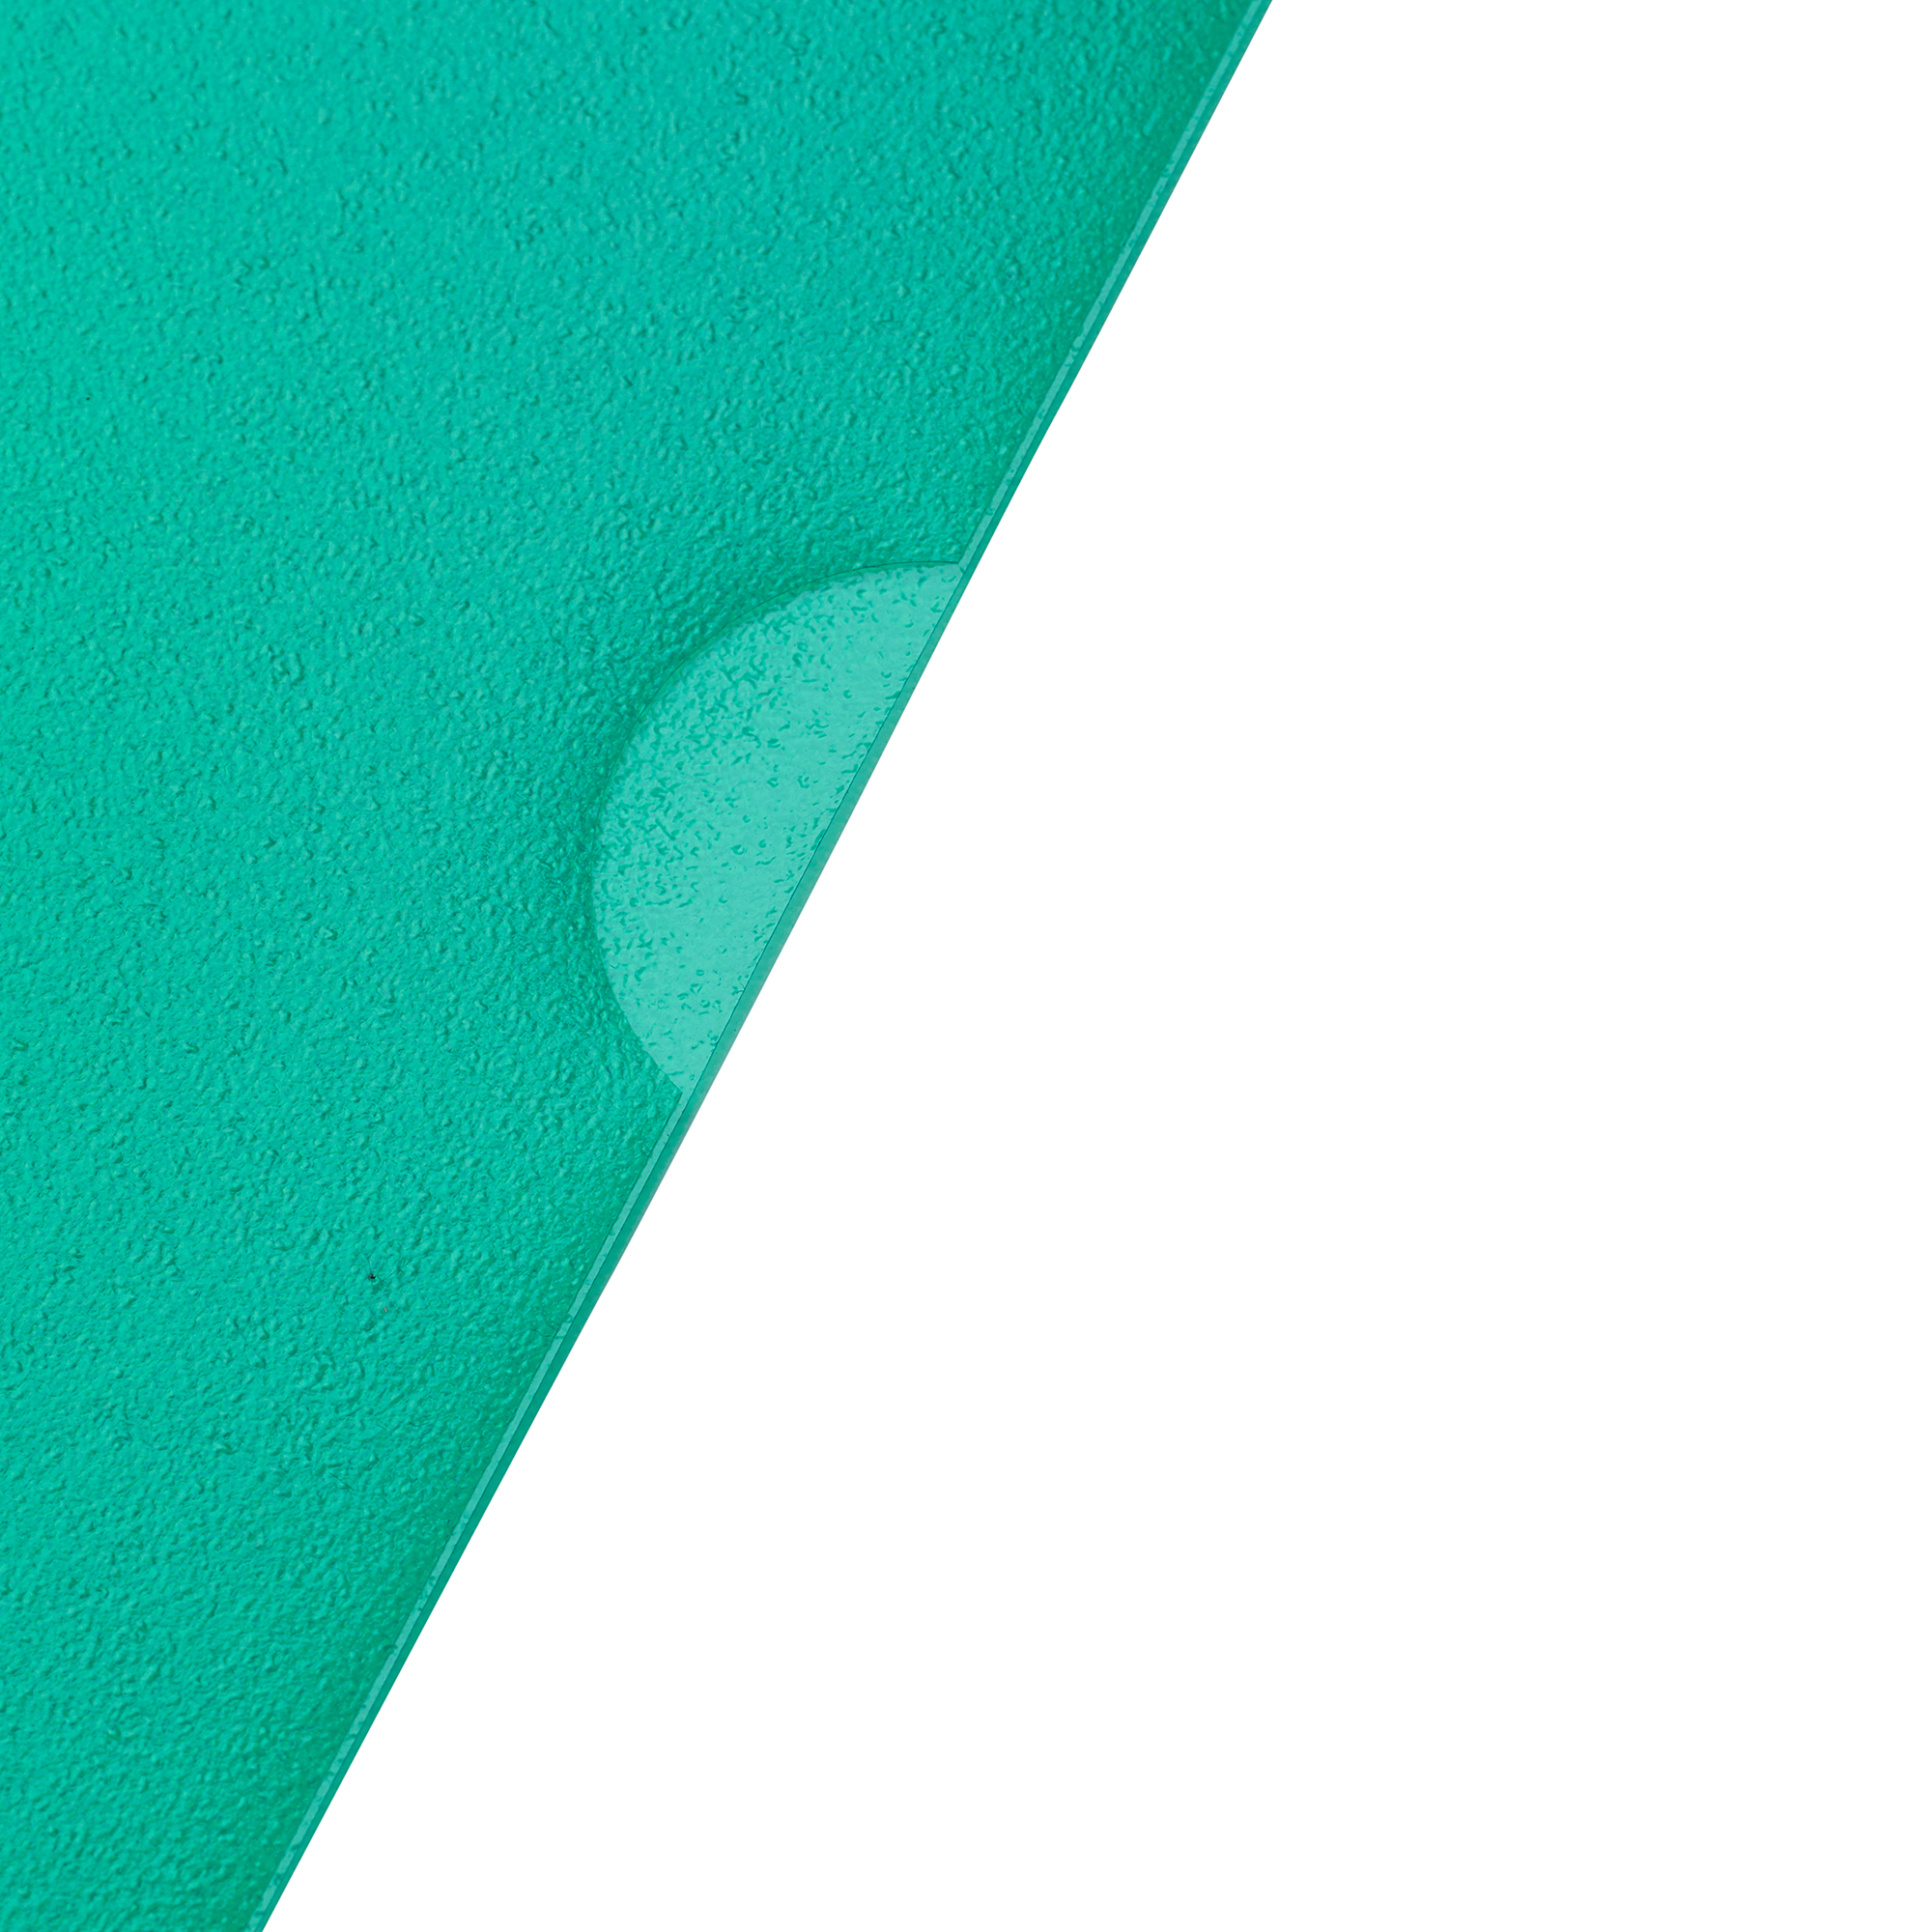 5 Star Office Folder Embossed Cut Flush Polypropylene Copy-safe Translucent 110 Micron A4 Green [Pack 25]